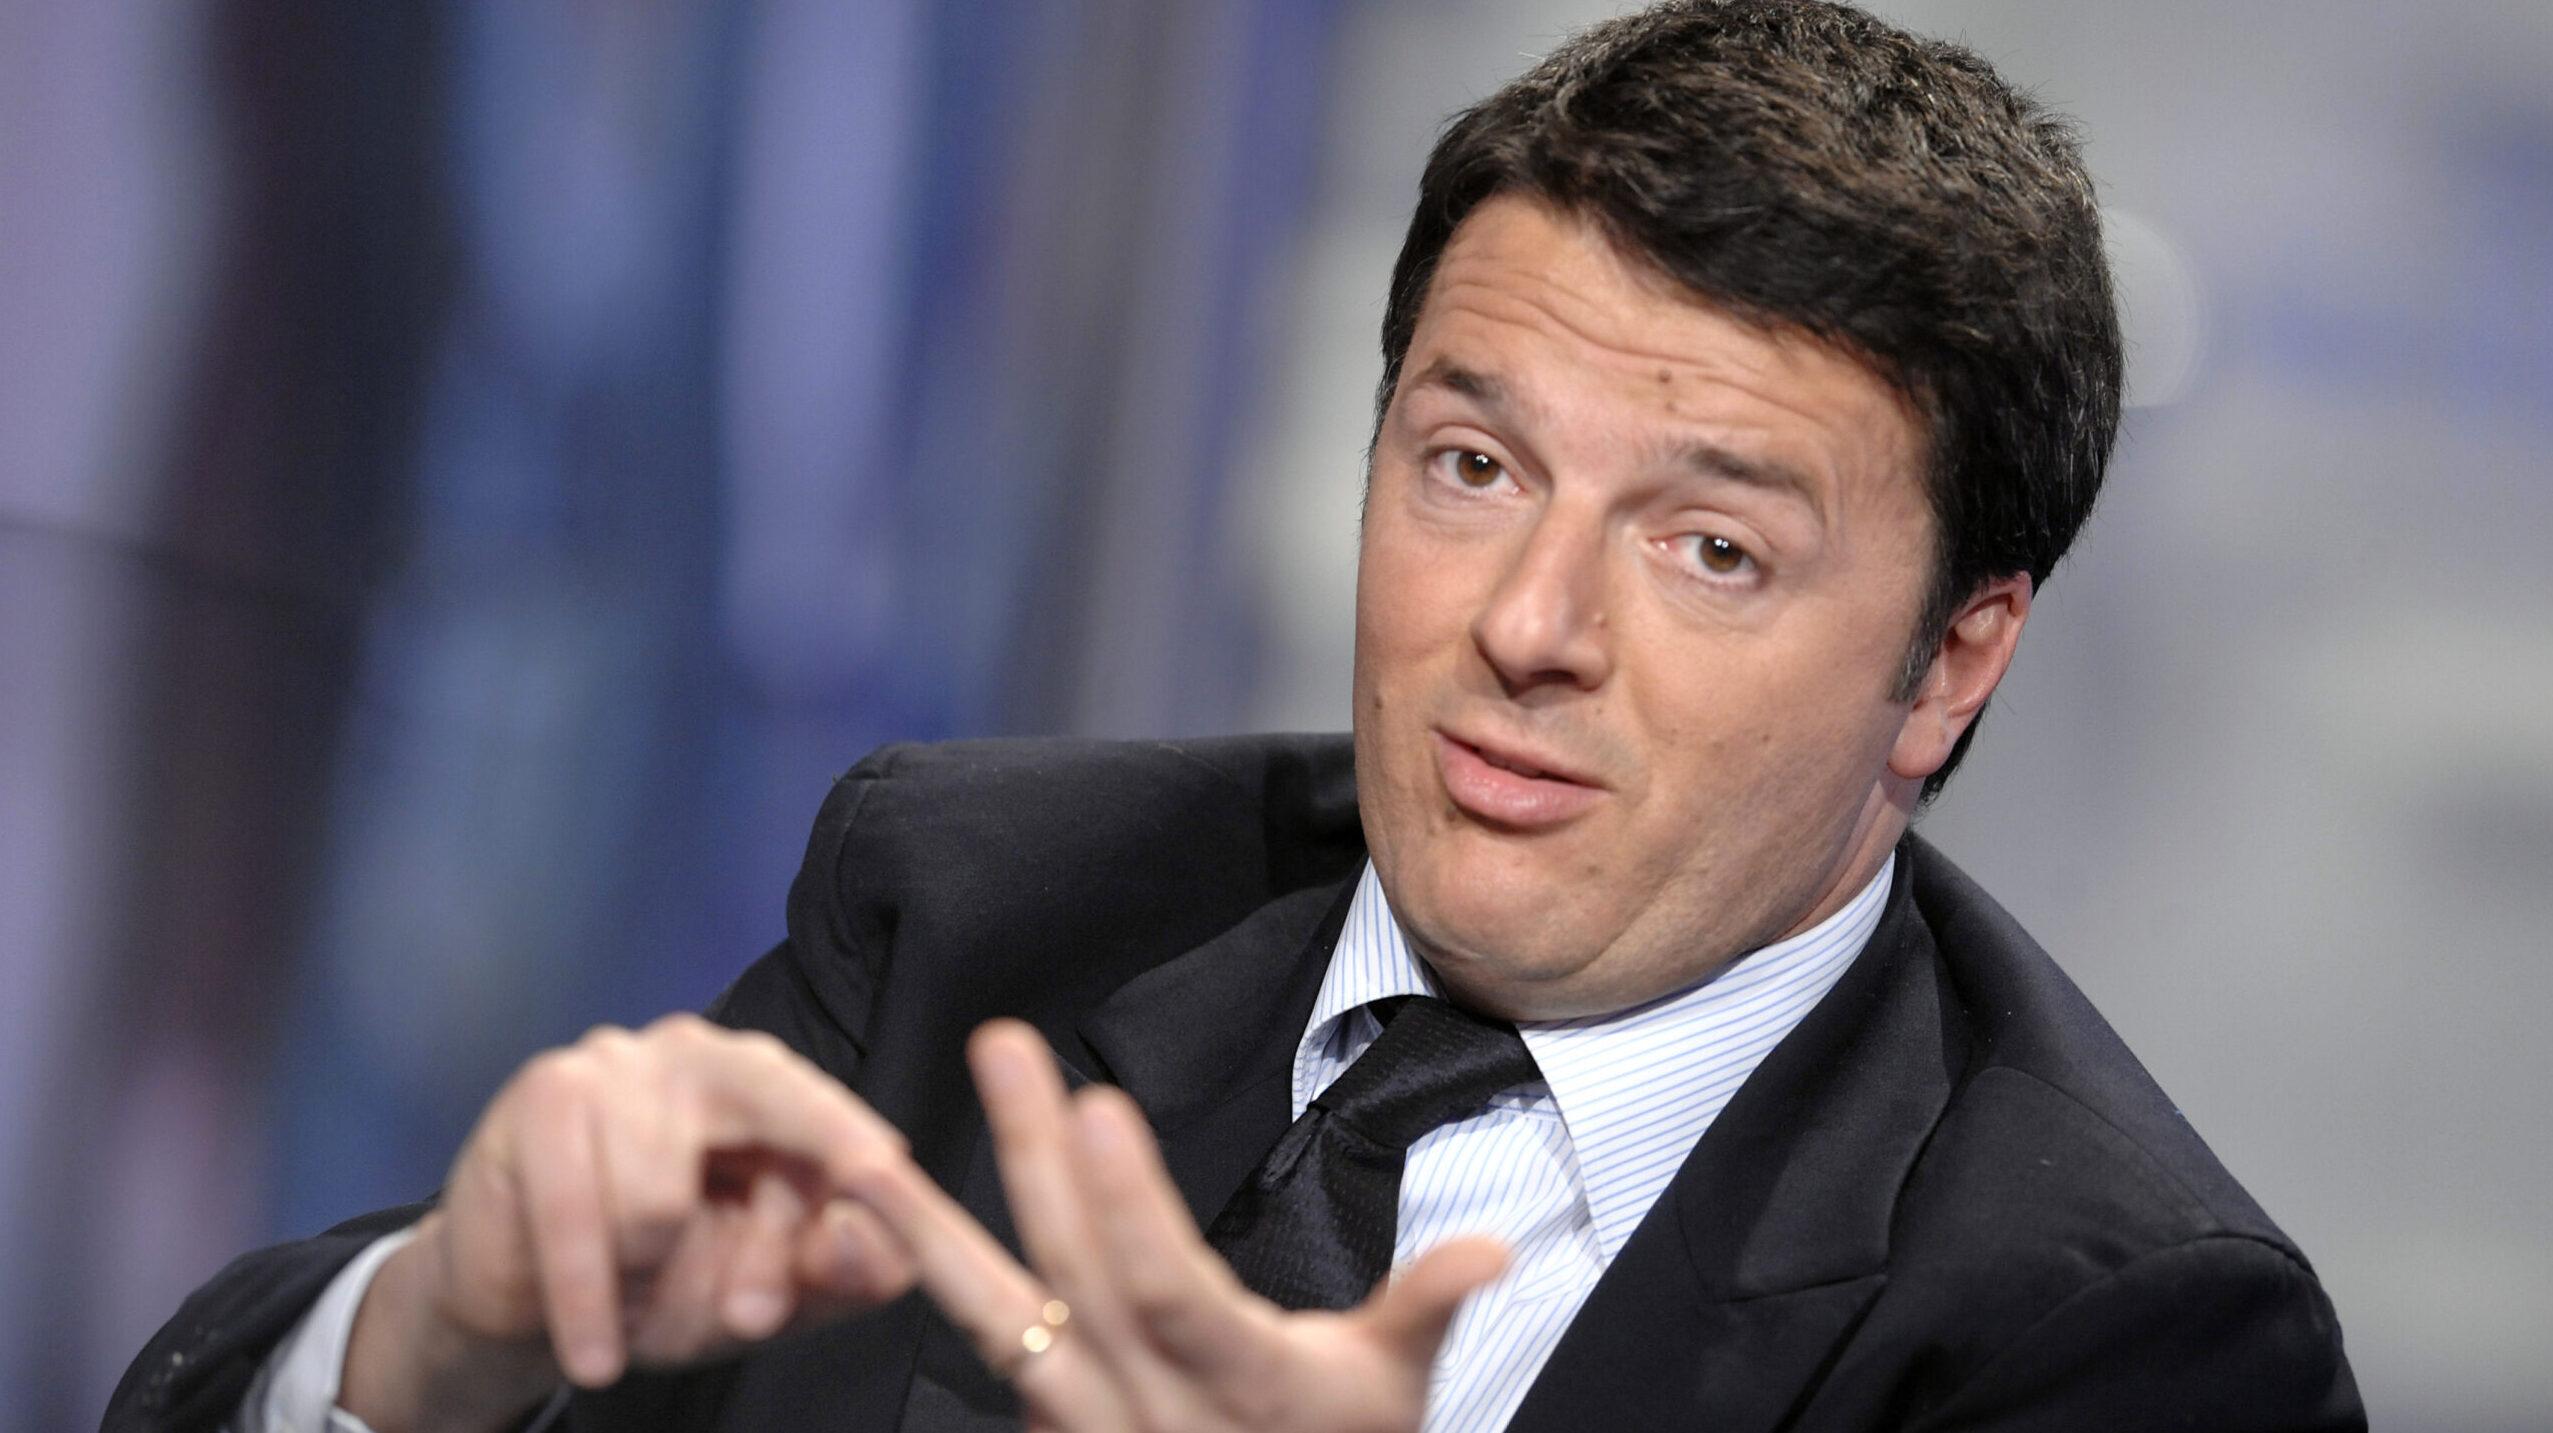 Caso Khashoggi, Renzi non scarica bin Salman